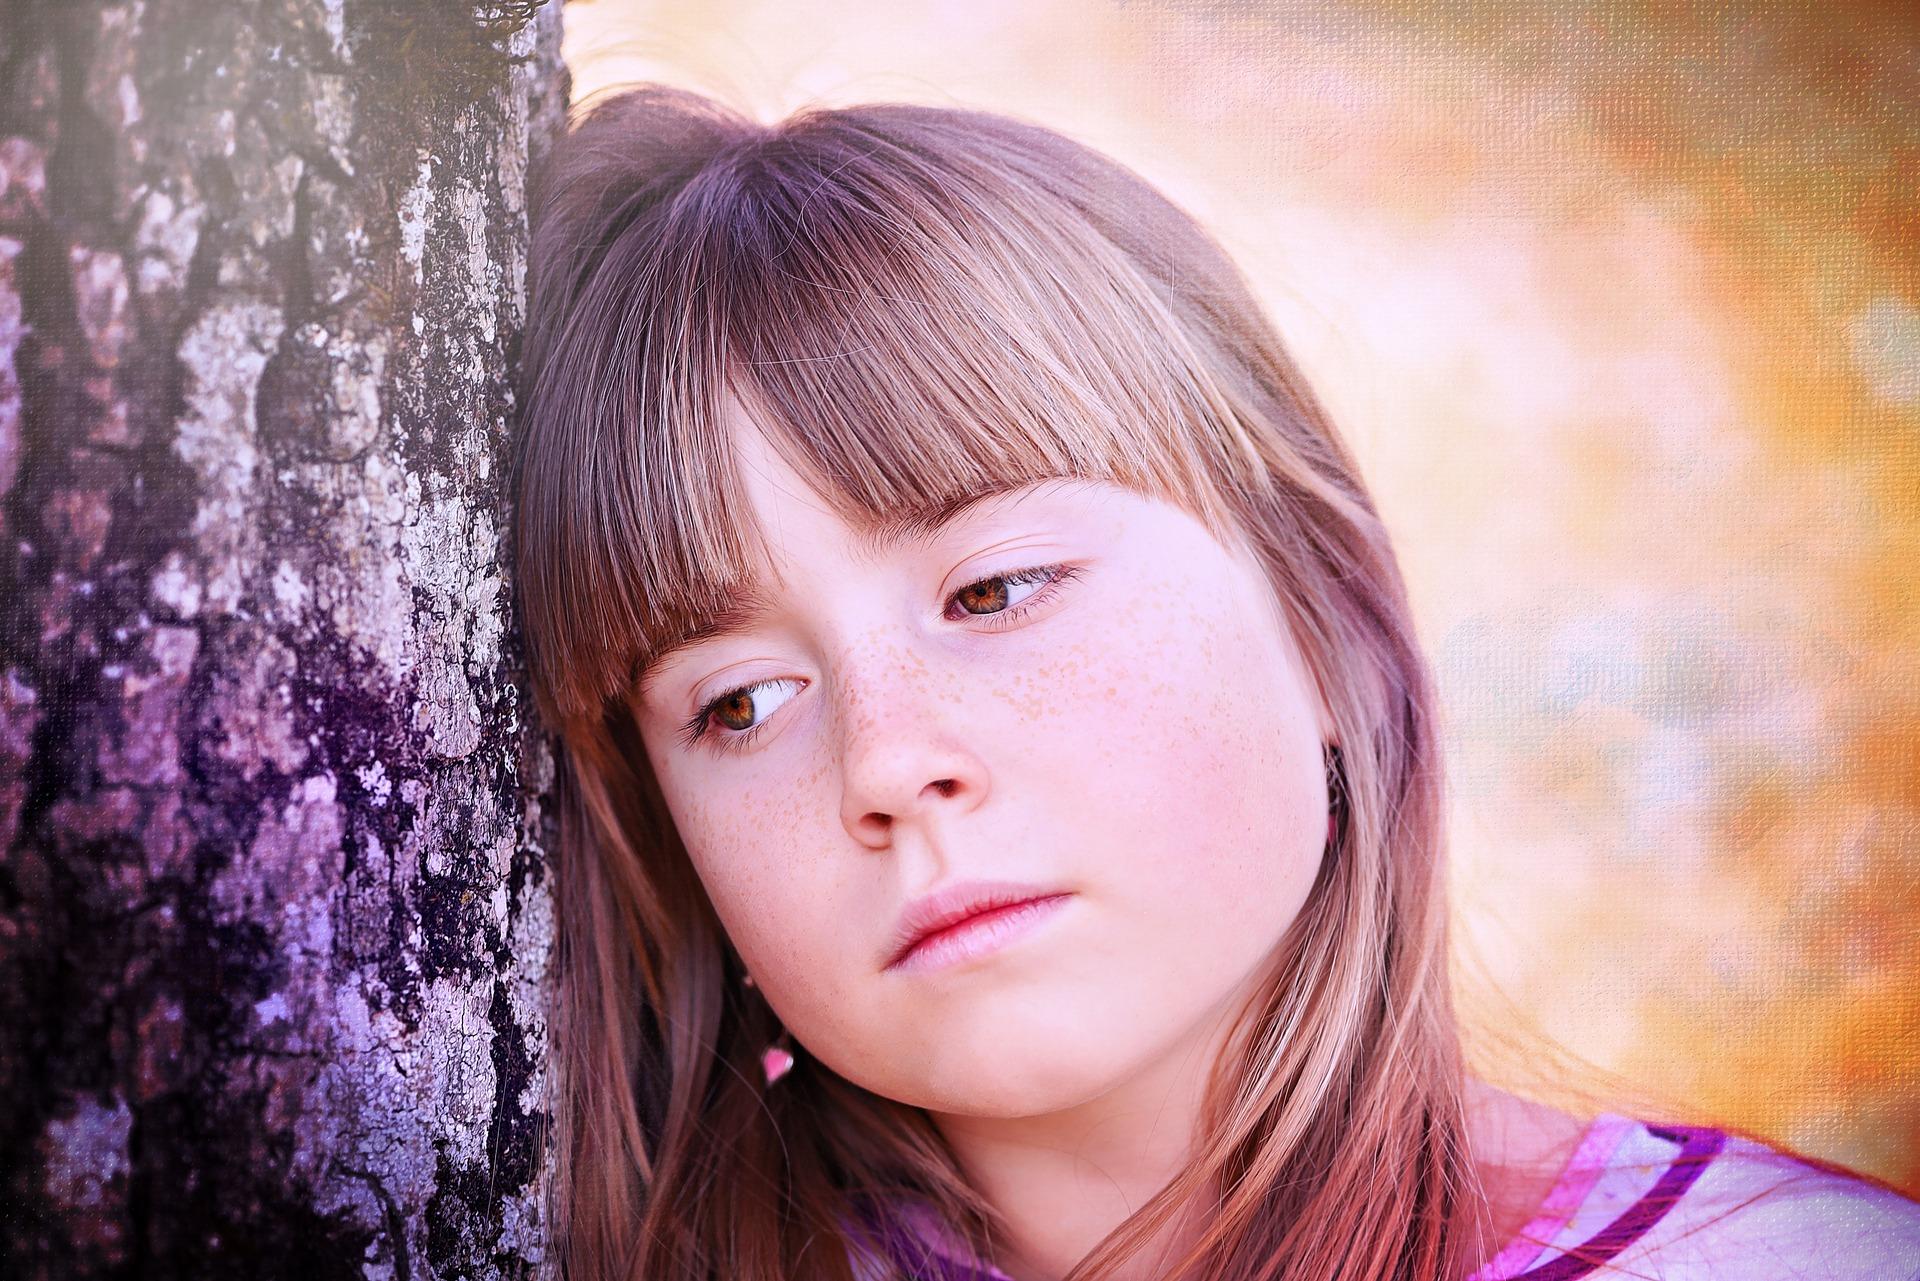 Sad child by tree